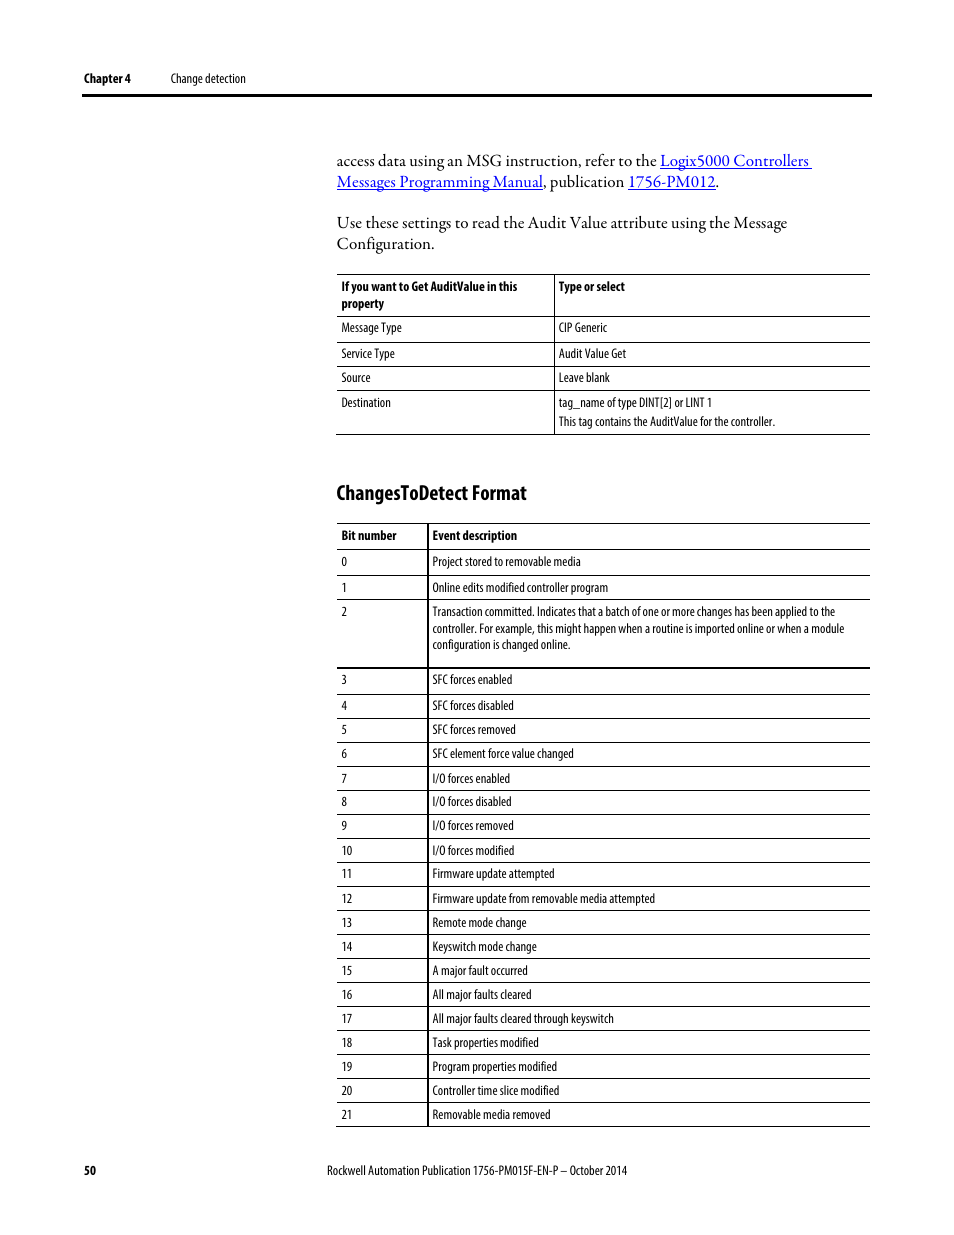 changestodetect format rockwell automation logix5000 controllers rh manualsdir com